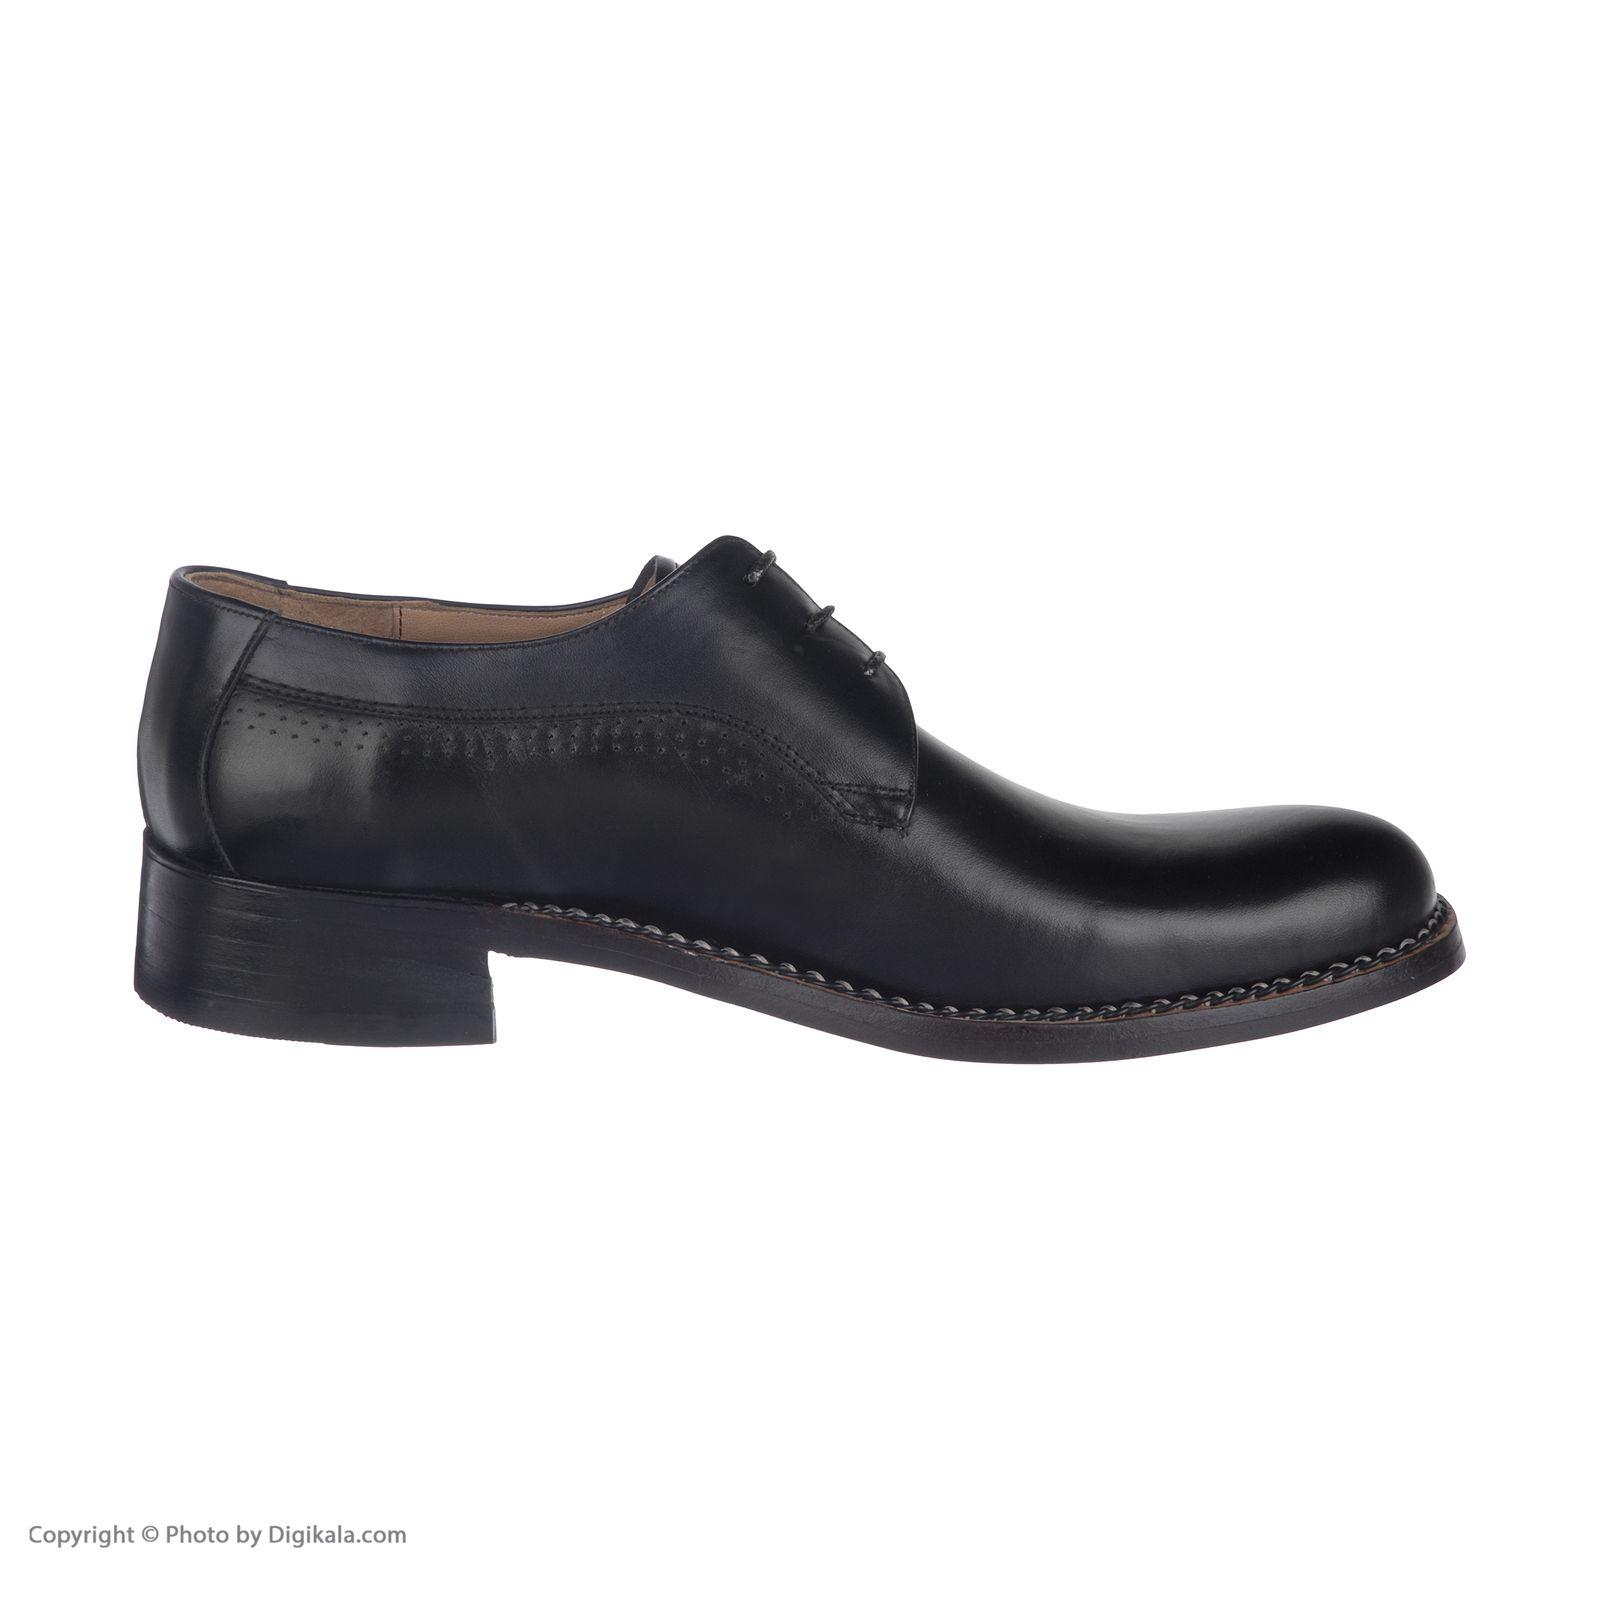 کفش مردانه نظری کد 405 -  - 5